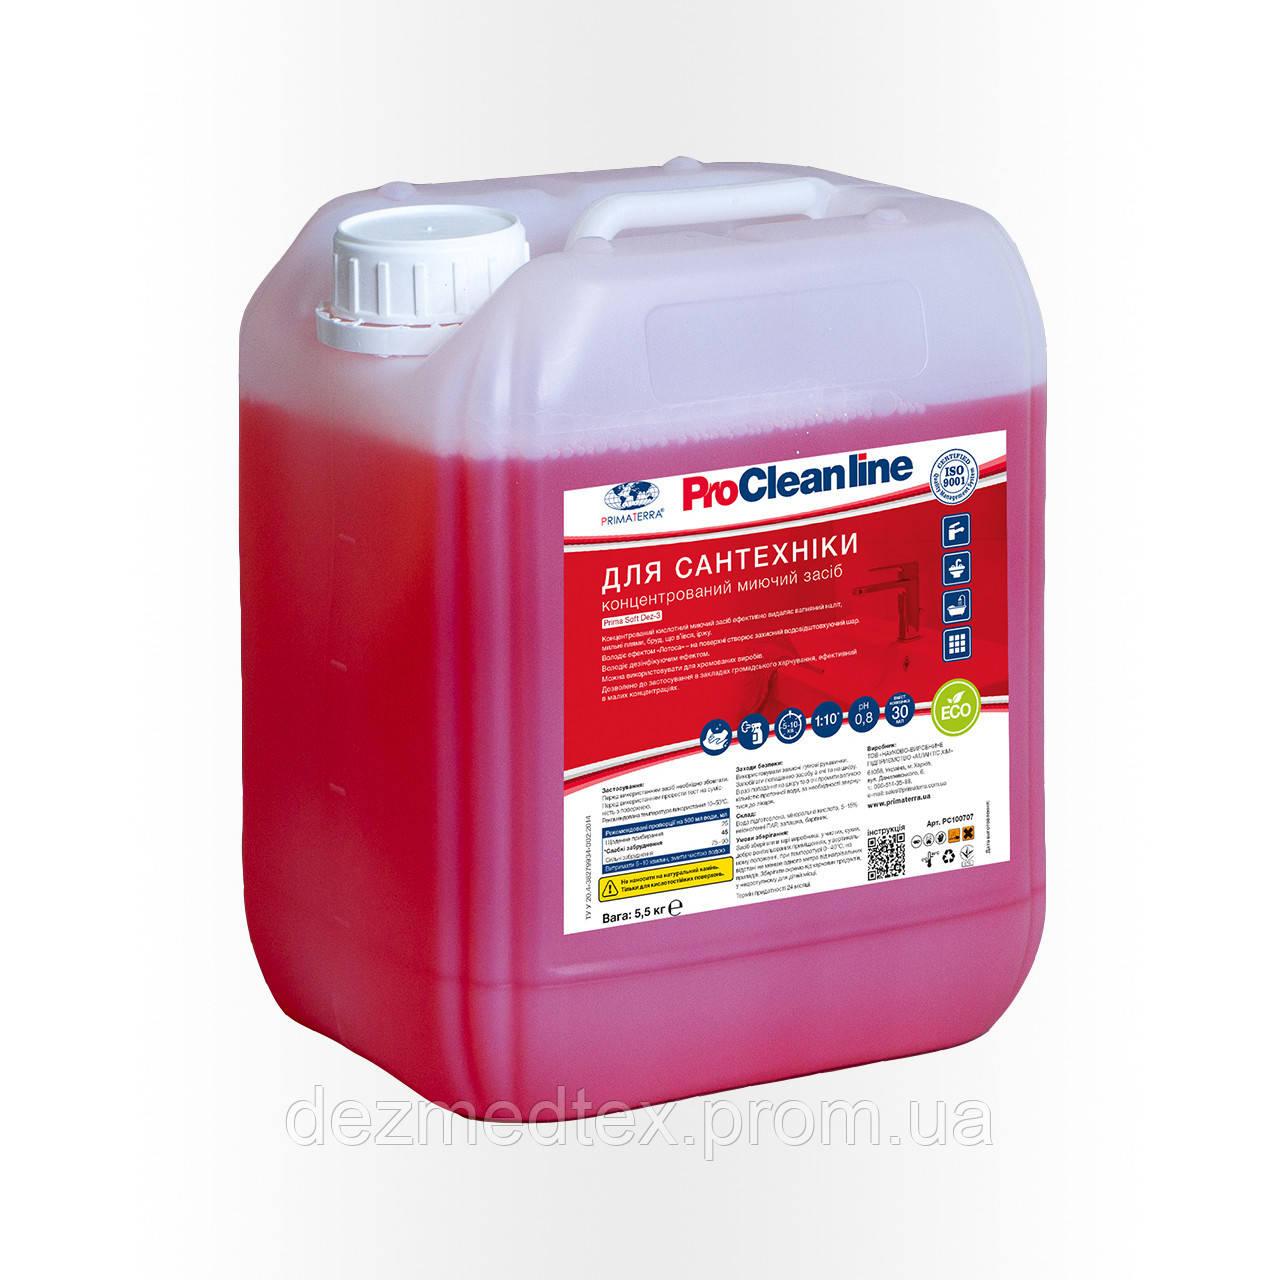 Моющее средство для сантехники Dez-3 (5,5кг)